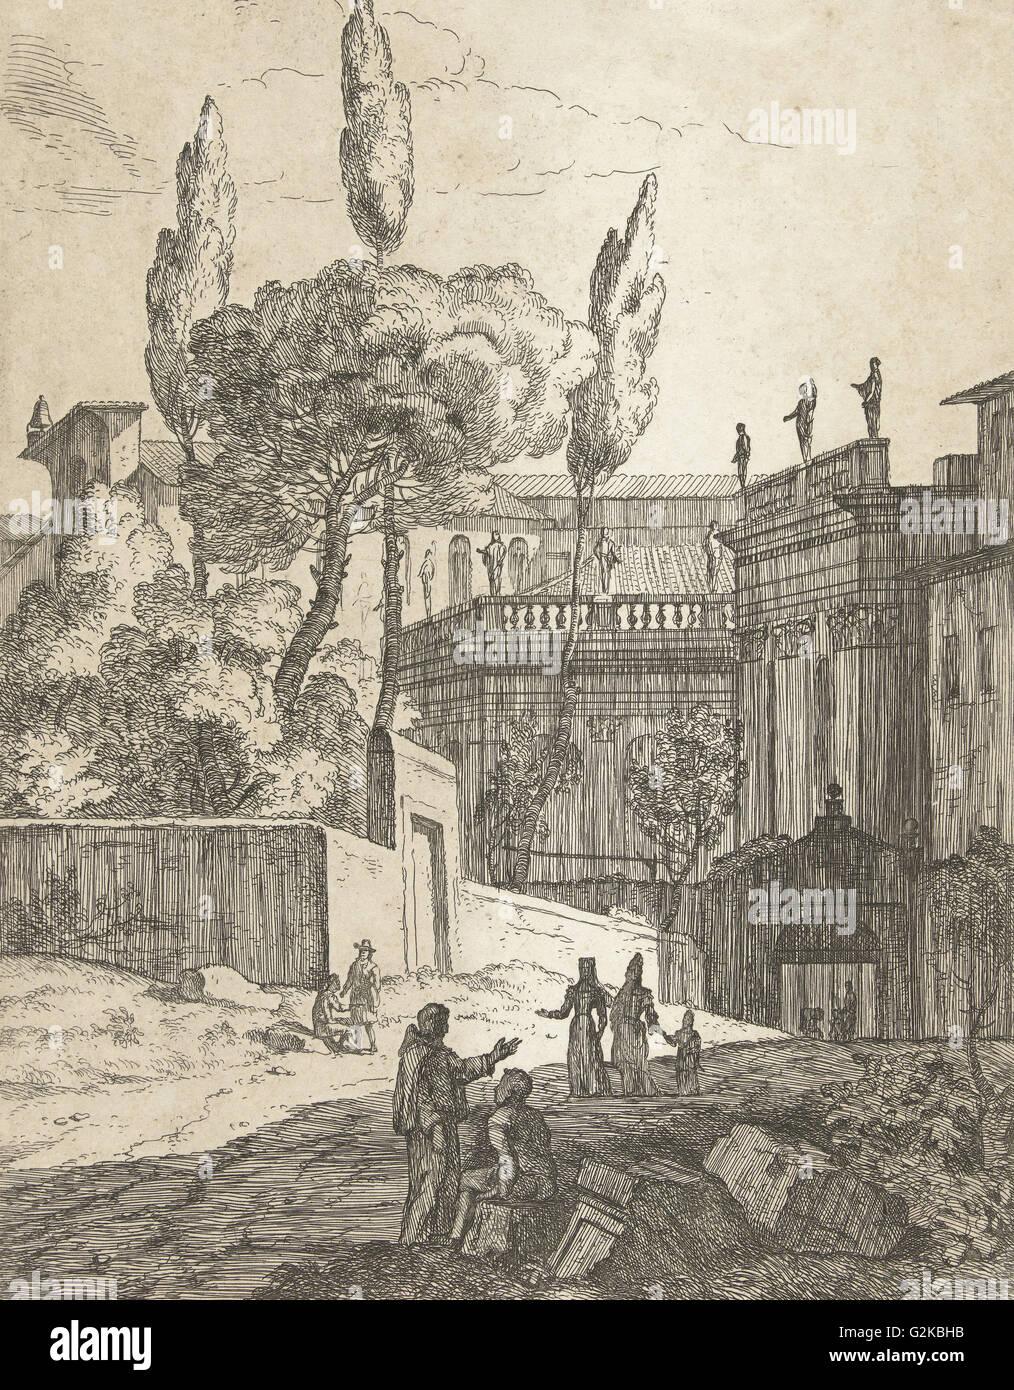 Italianate landscape with antique buildings and figures, Jan Frans van Bloemen, 1689 - 1749 - Stock Image